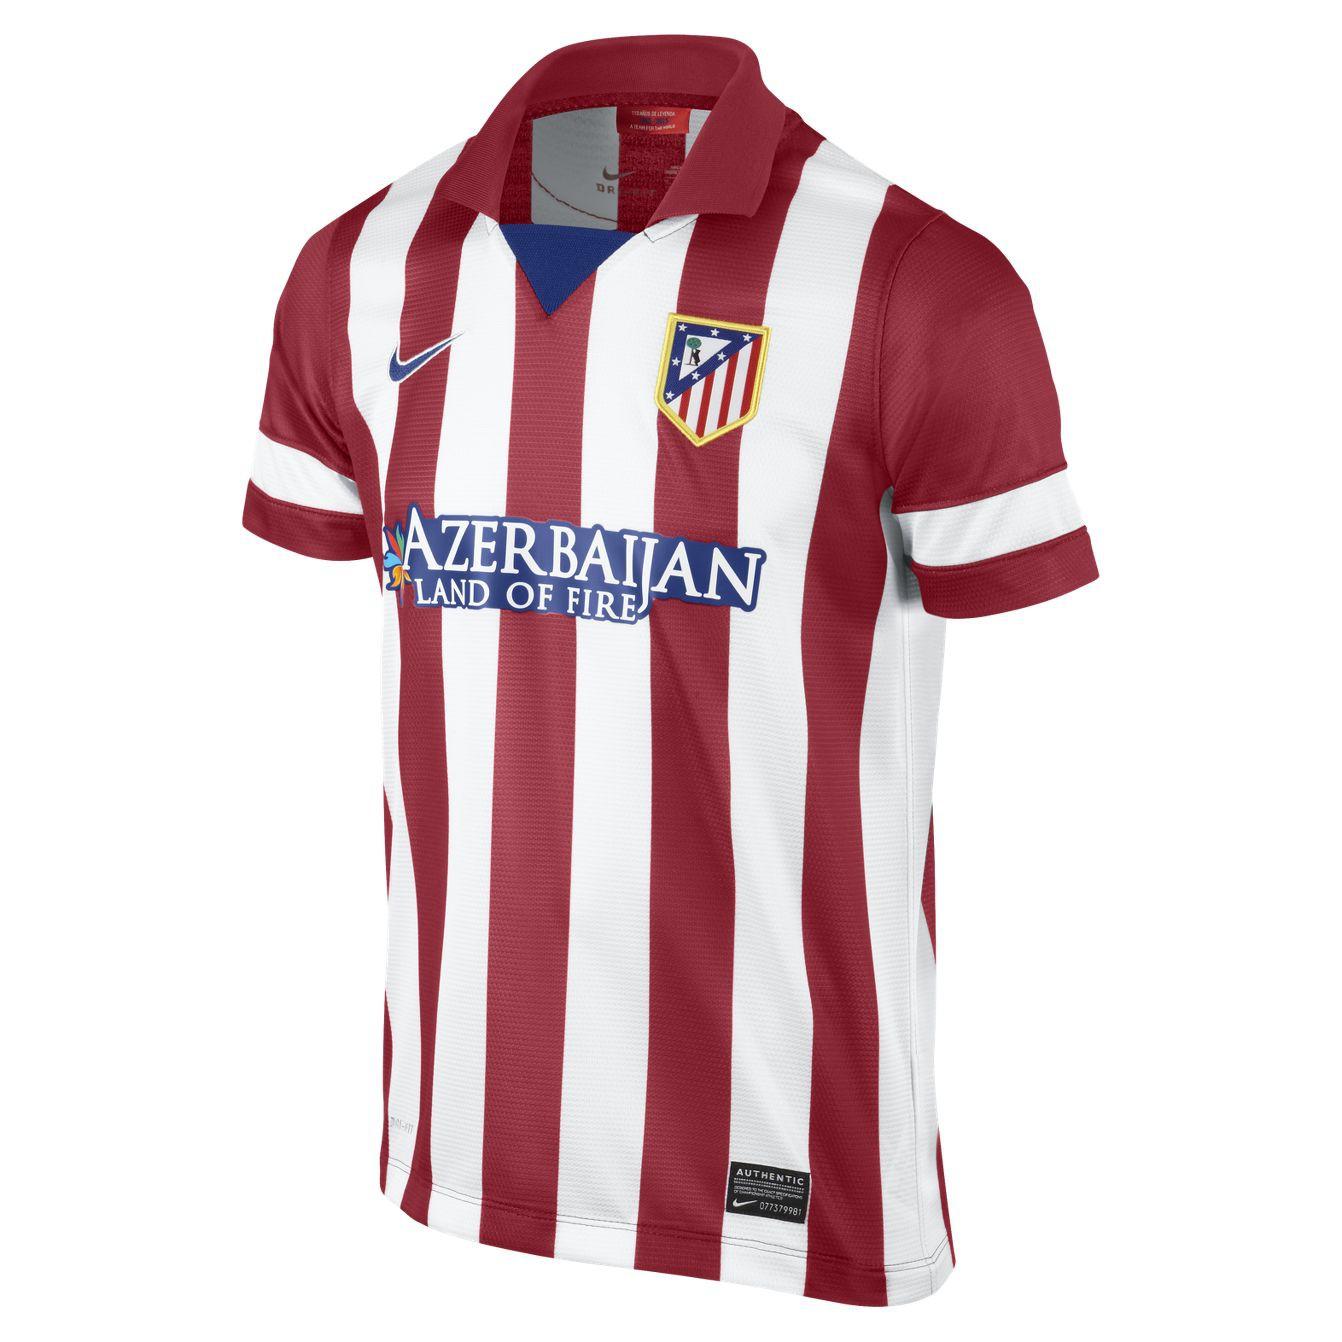 Atletico de madrid short sleeve jersey 2013/14